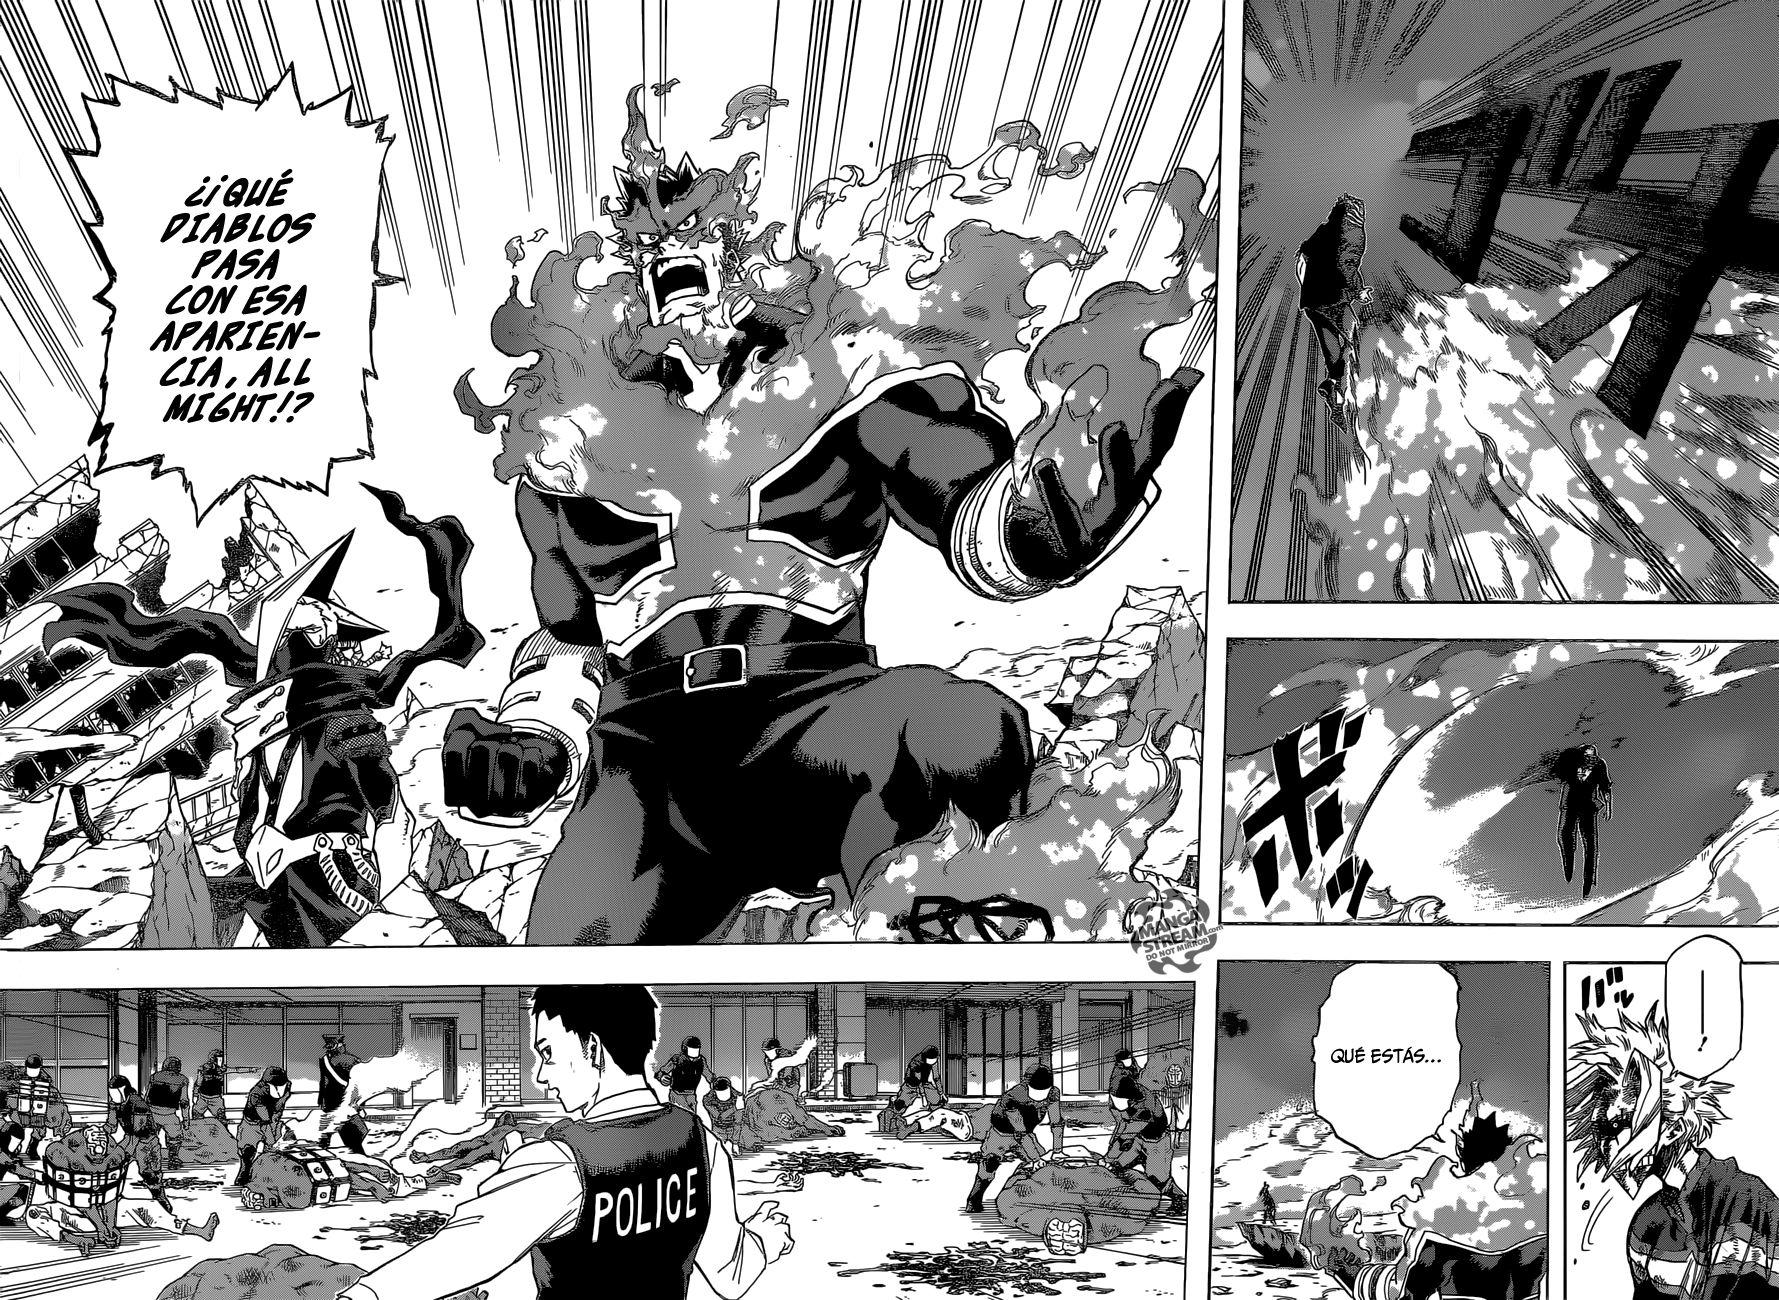 http://c5.ninemanga.com/es_manga/54/182/468024/347ffc25fdeed7c35847b4a977d70a61.jpg Page 7